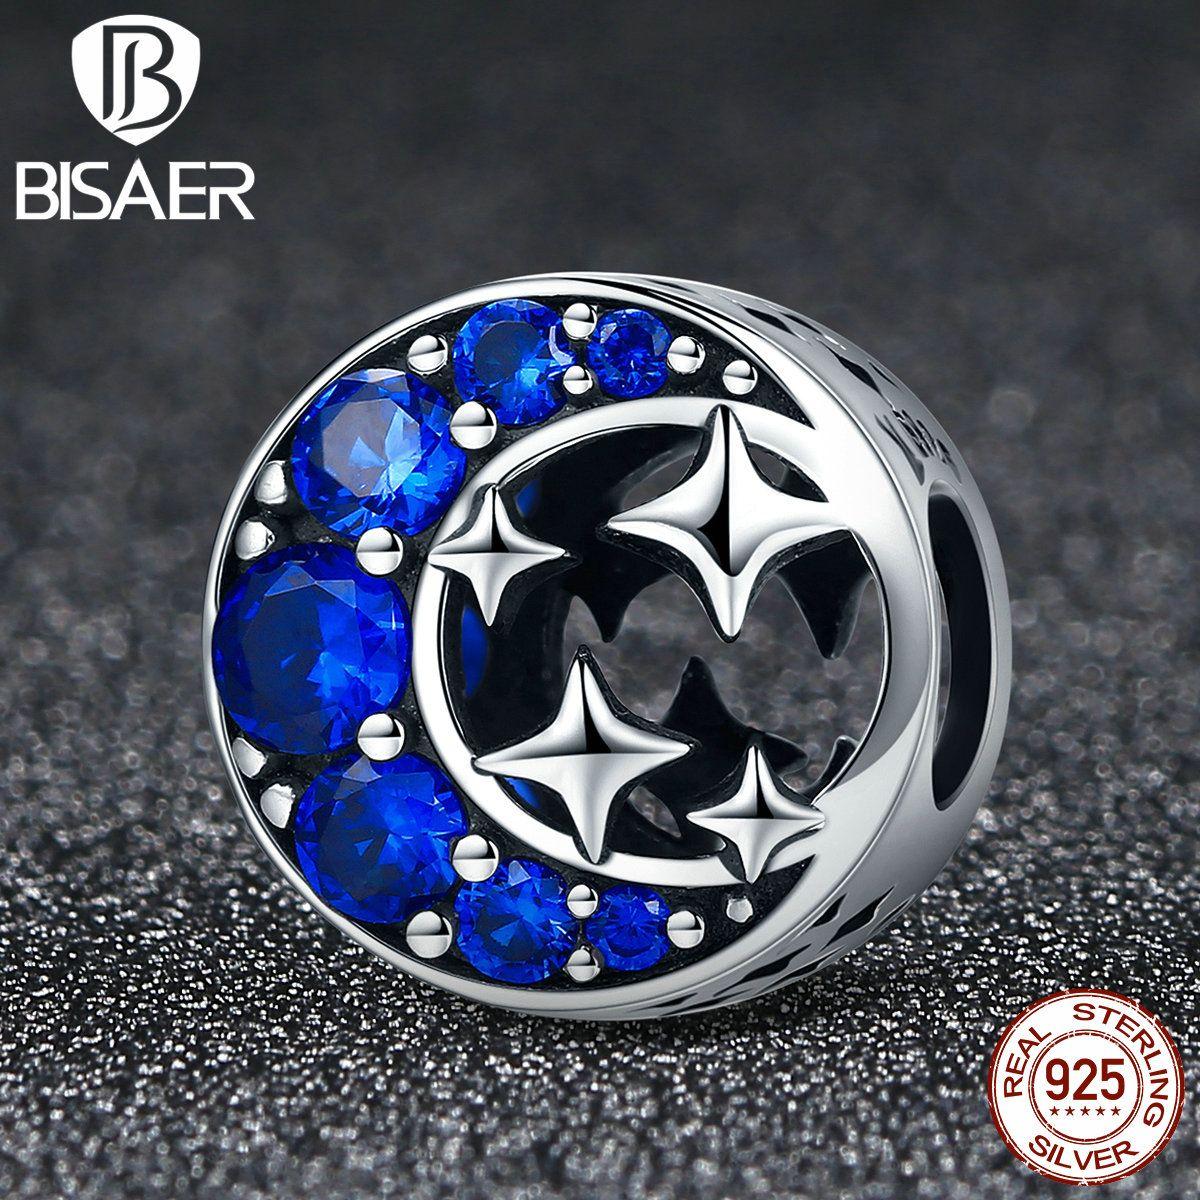 100% 925 Sterling Silver Moon & Stars legend, Fairy Tale Charms Fit Original BISAER Bracelets For Women Jewelry ECC184